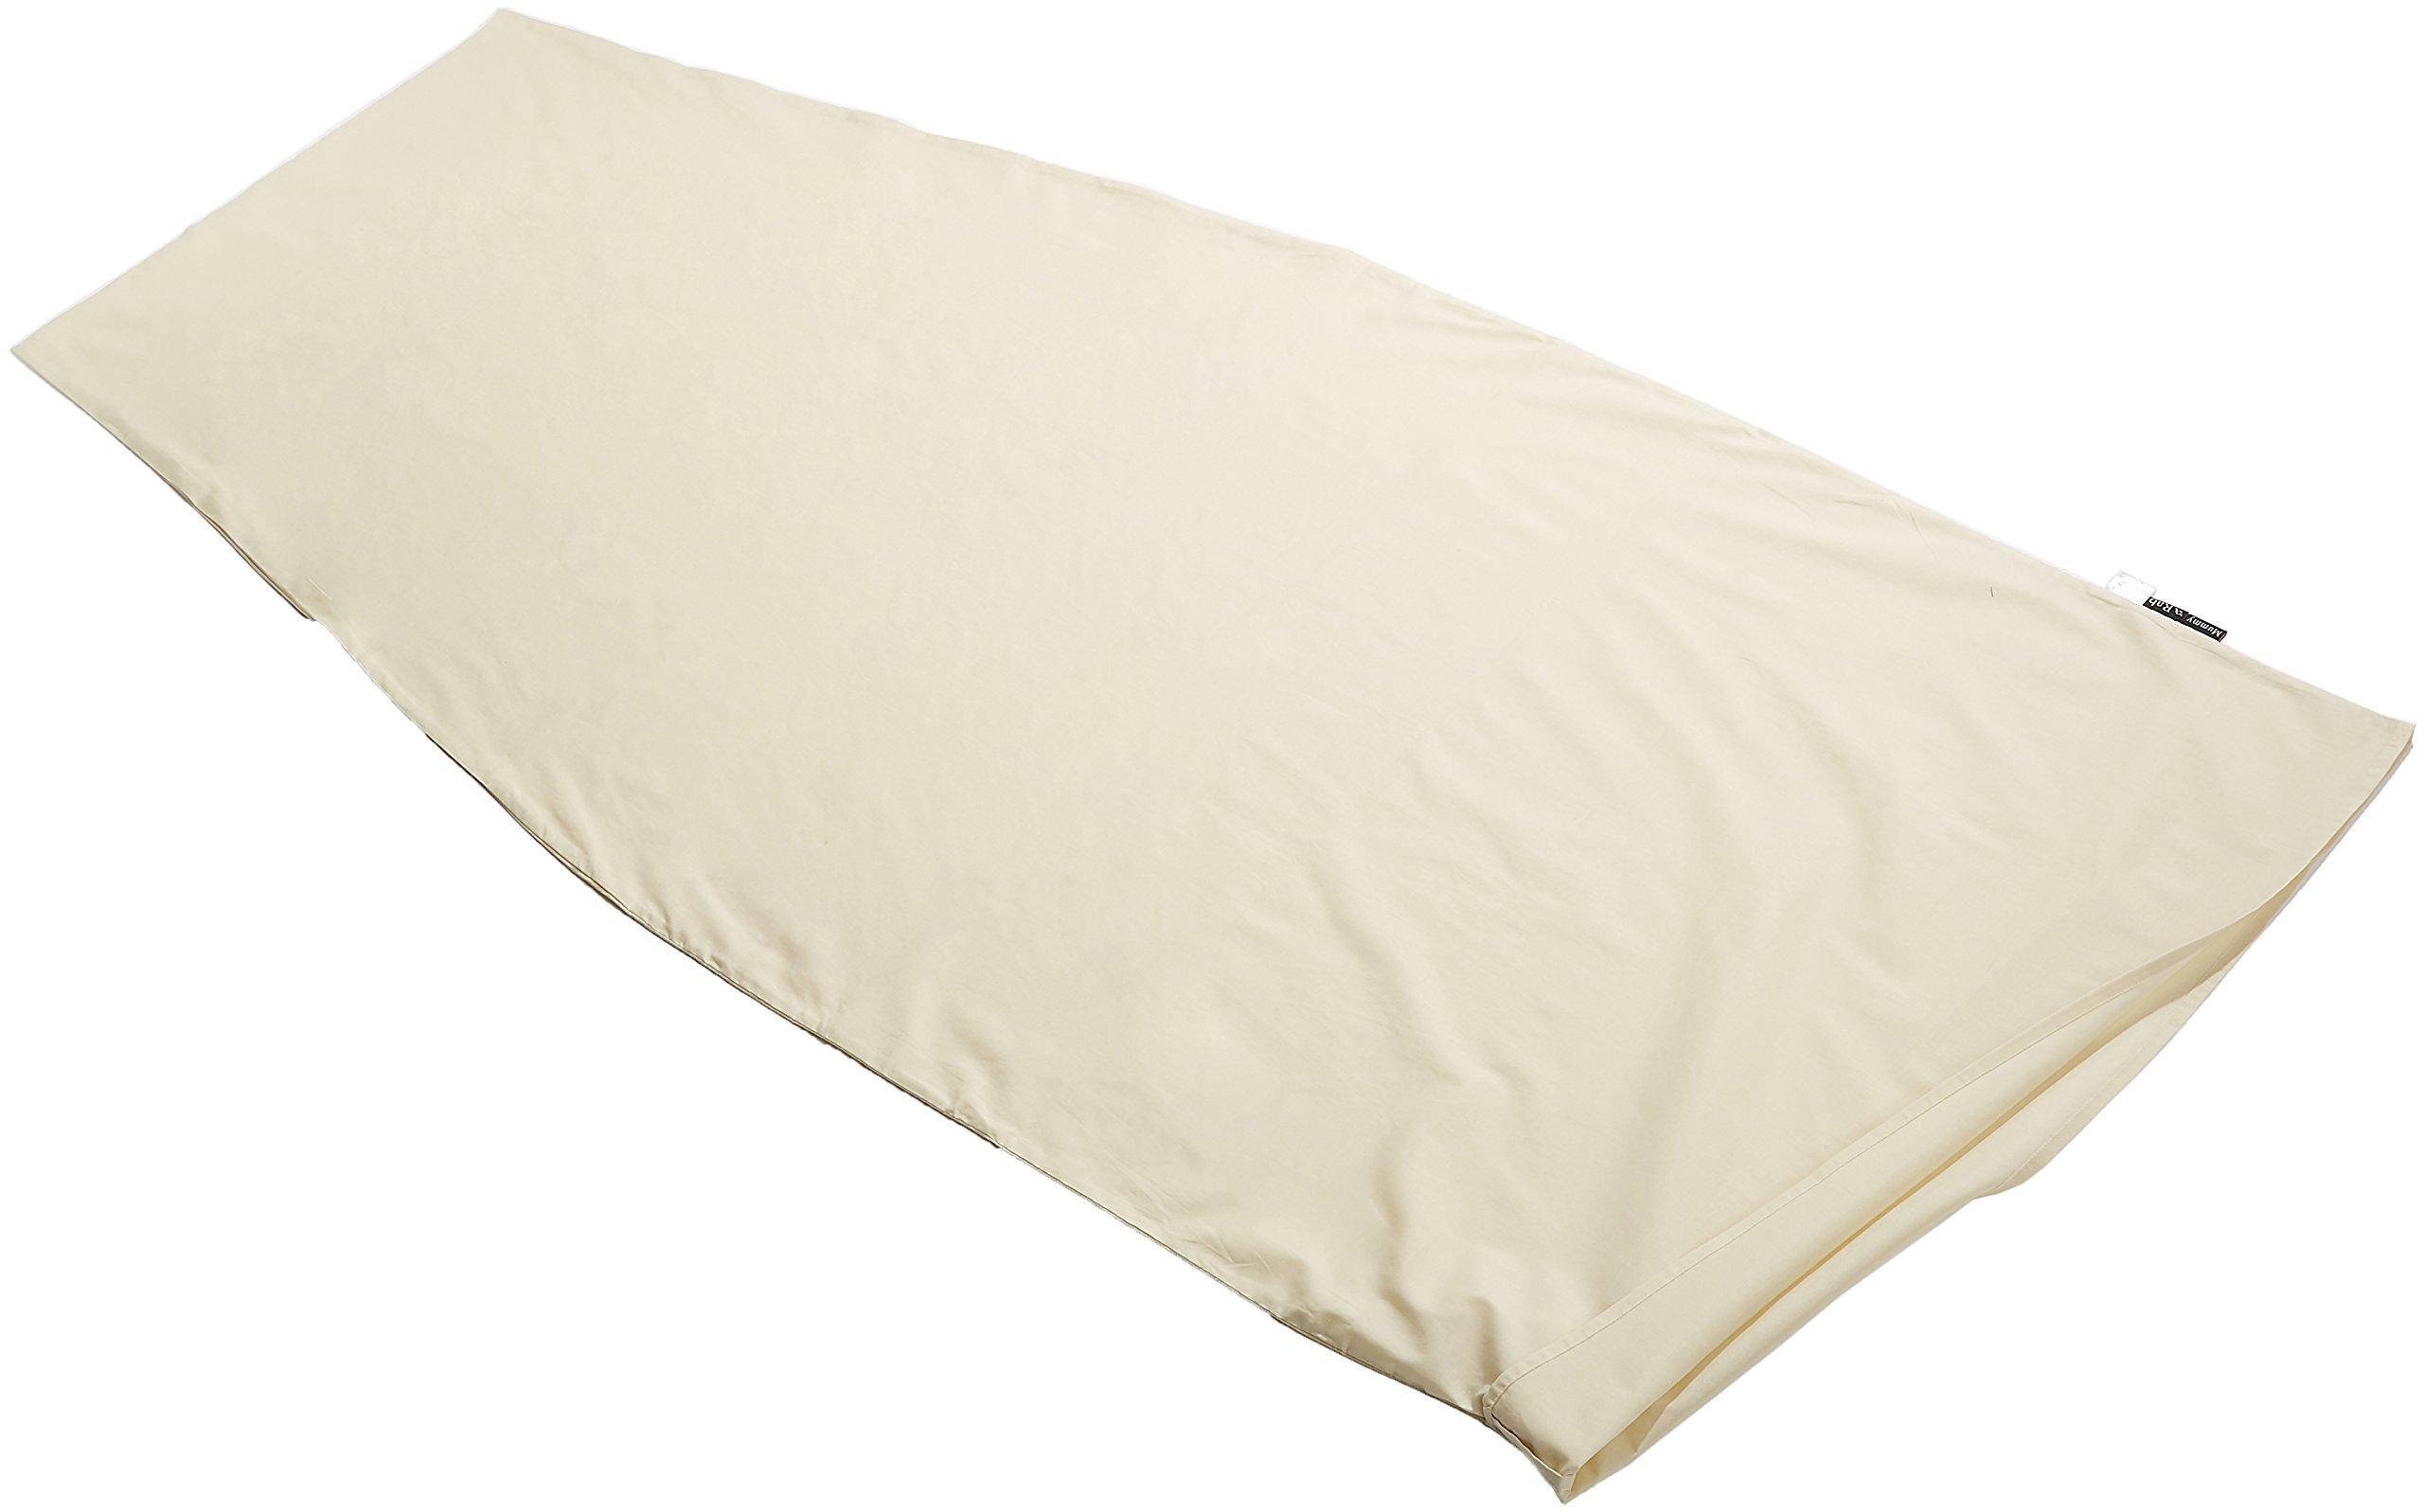 RAB Cotton Sleeping Bag Liner - Mummy by RAB